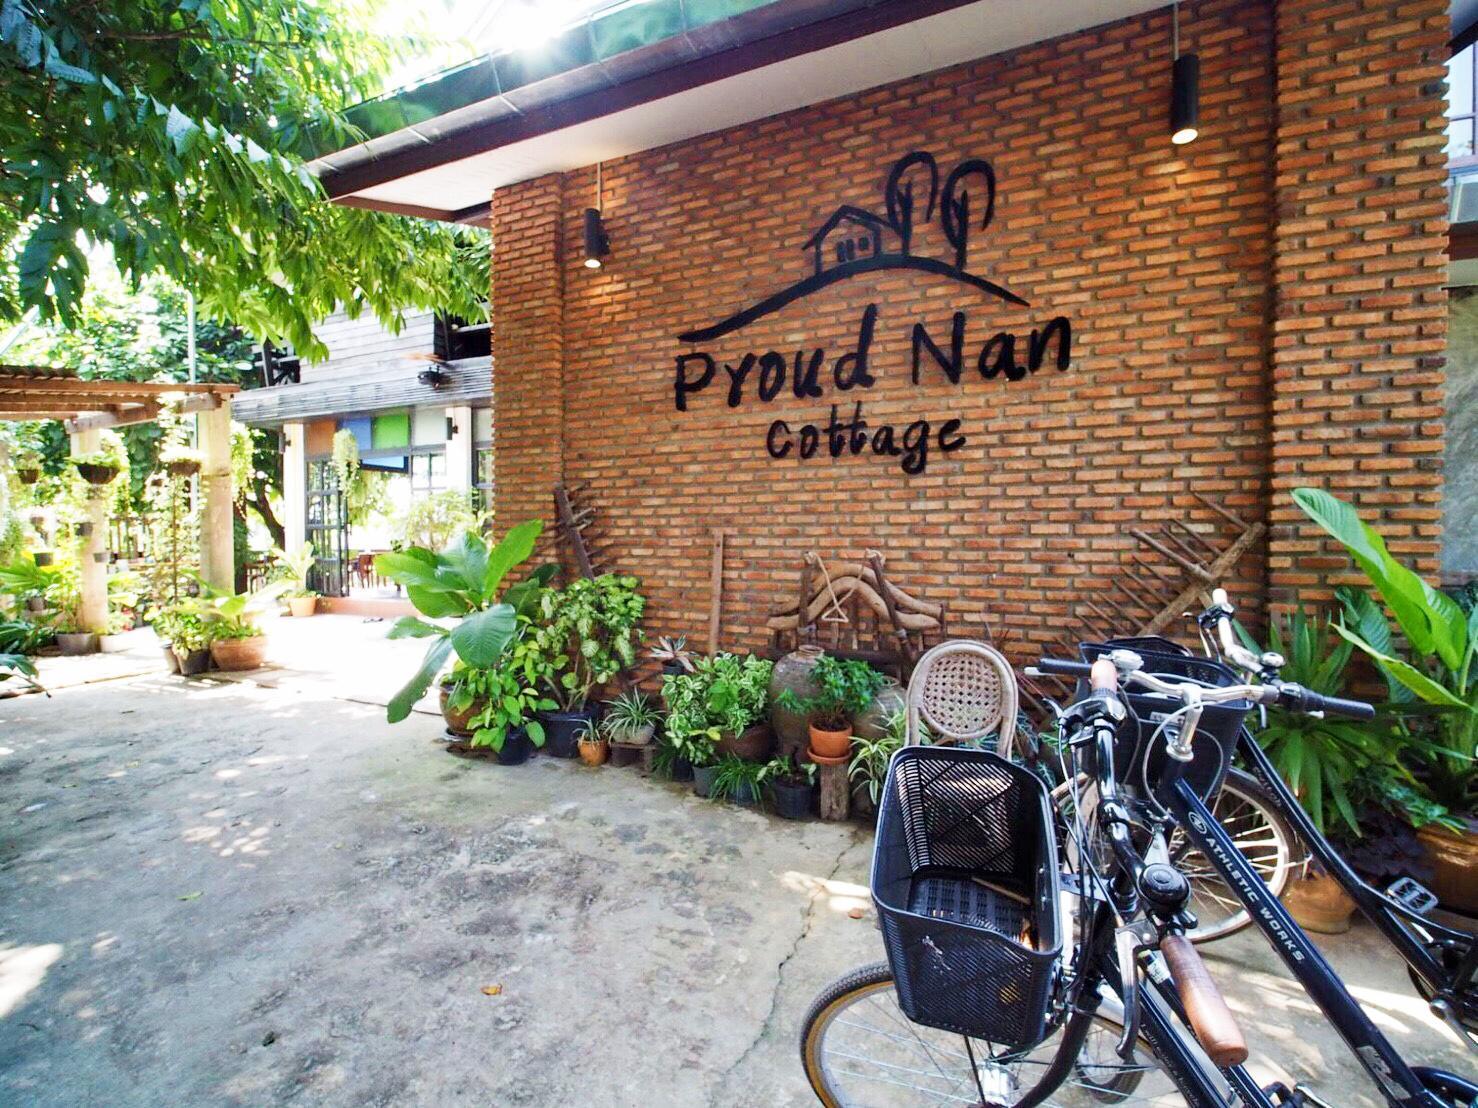 Proud nan cottage Reviews